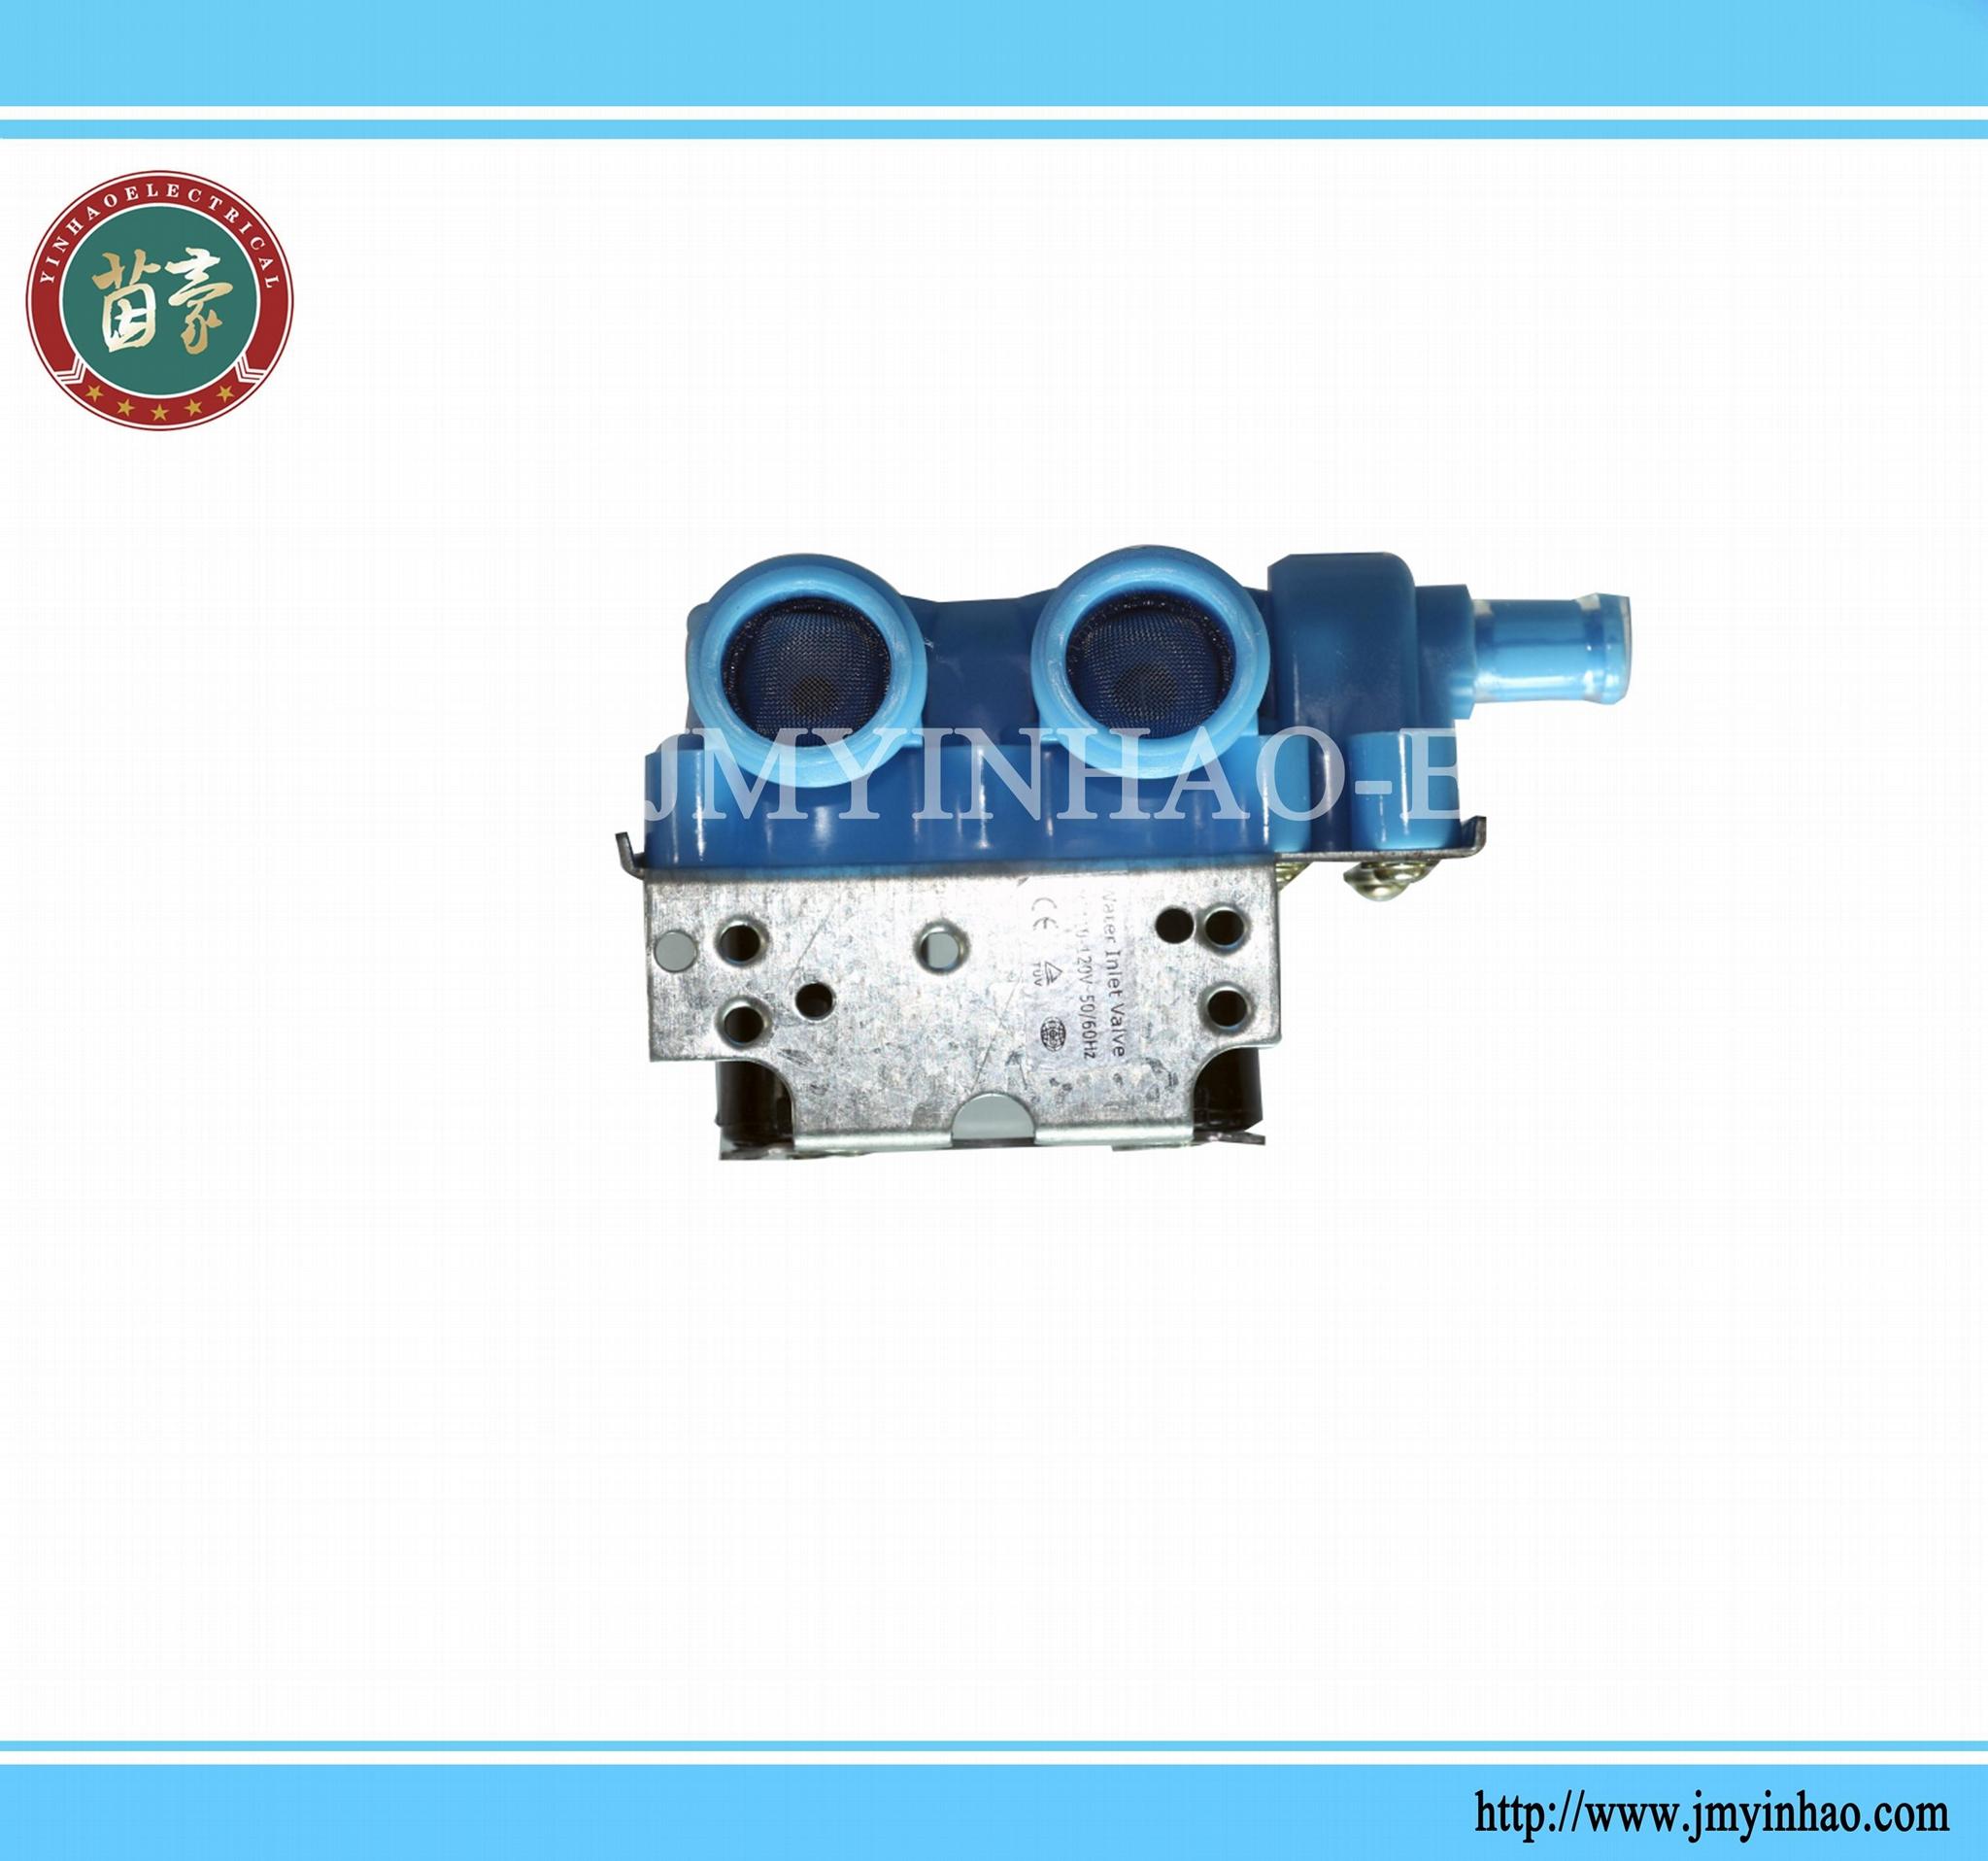 Water Inlet Valve for Whirlpool Kenmore Washer Washing Machine W10110517 2